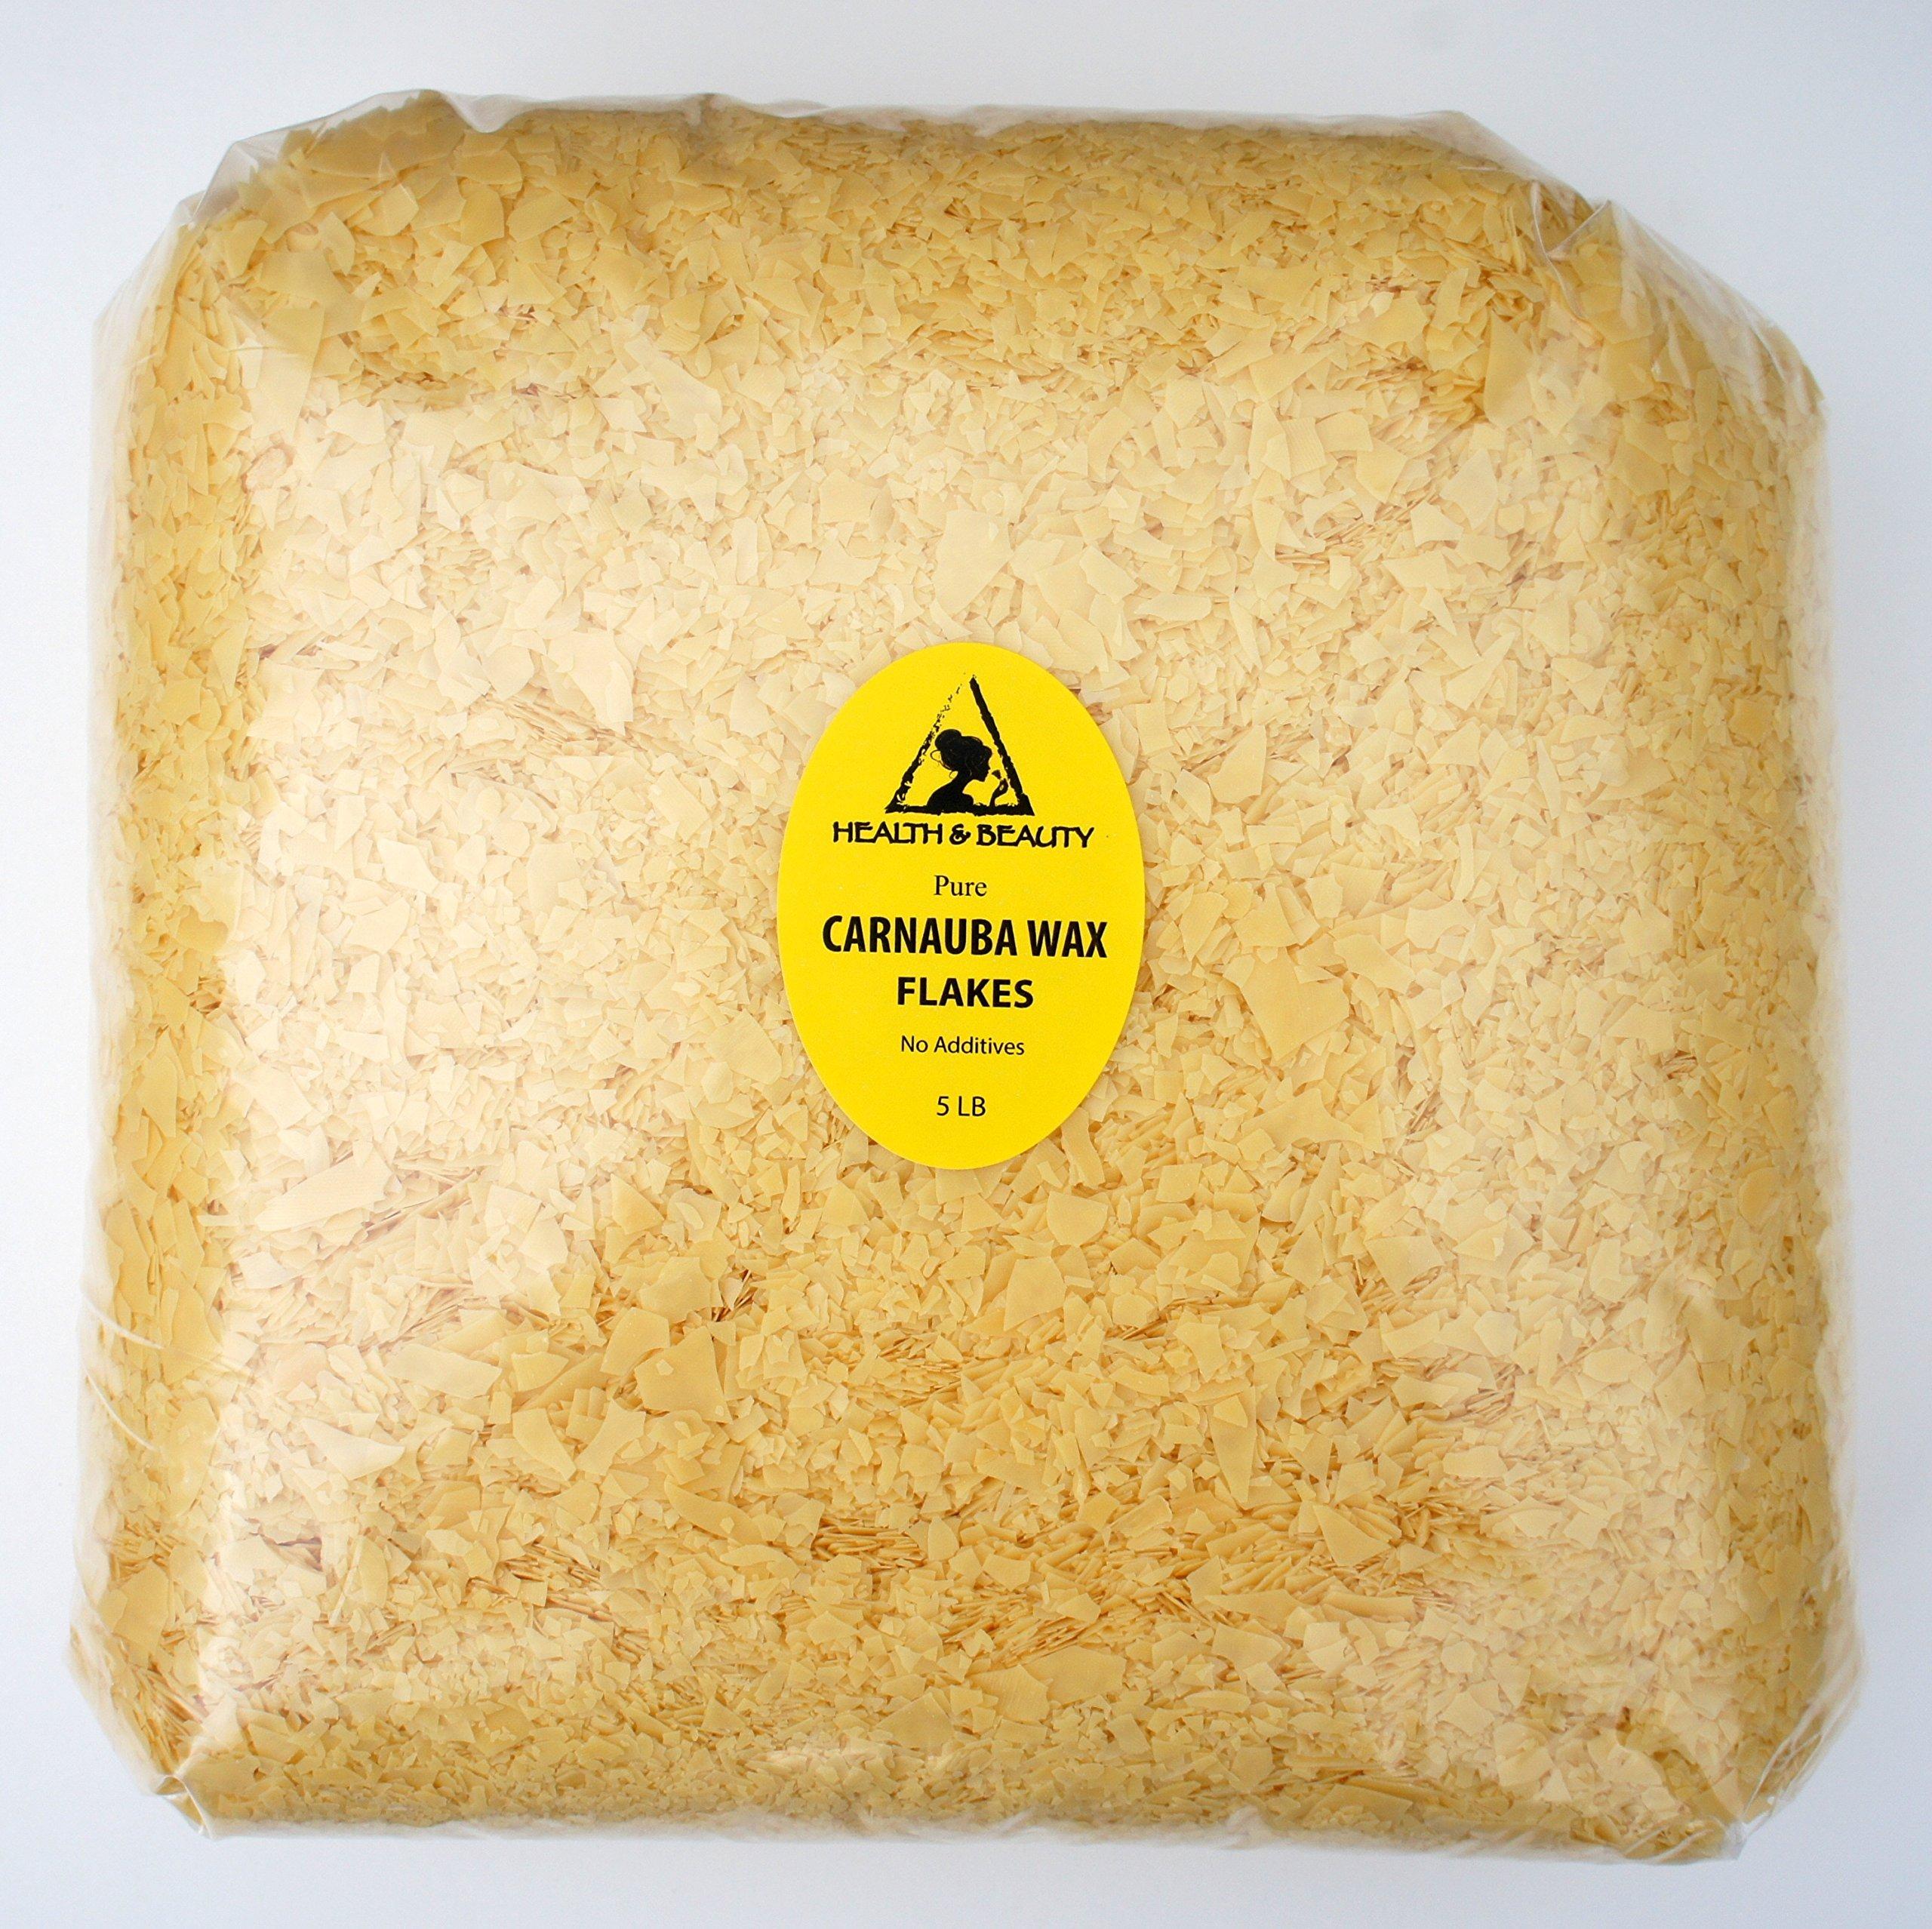 Carnauba Wax Organic Flakes Brazil Pastilles Beards Premium Prime Grade A 100% Pure 5 LB